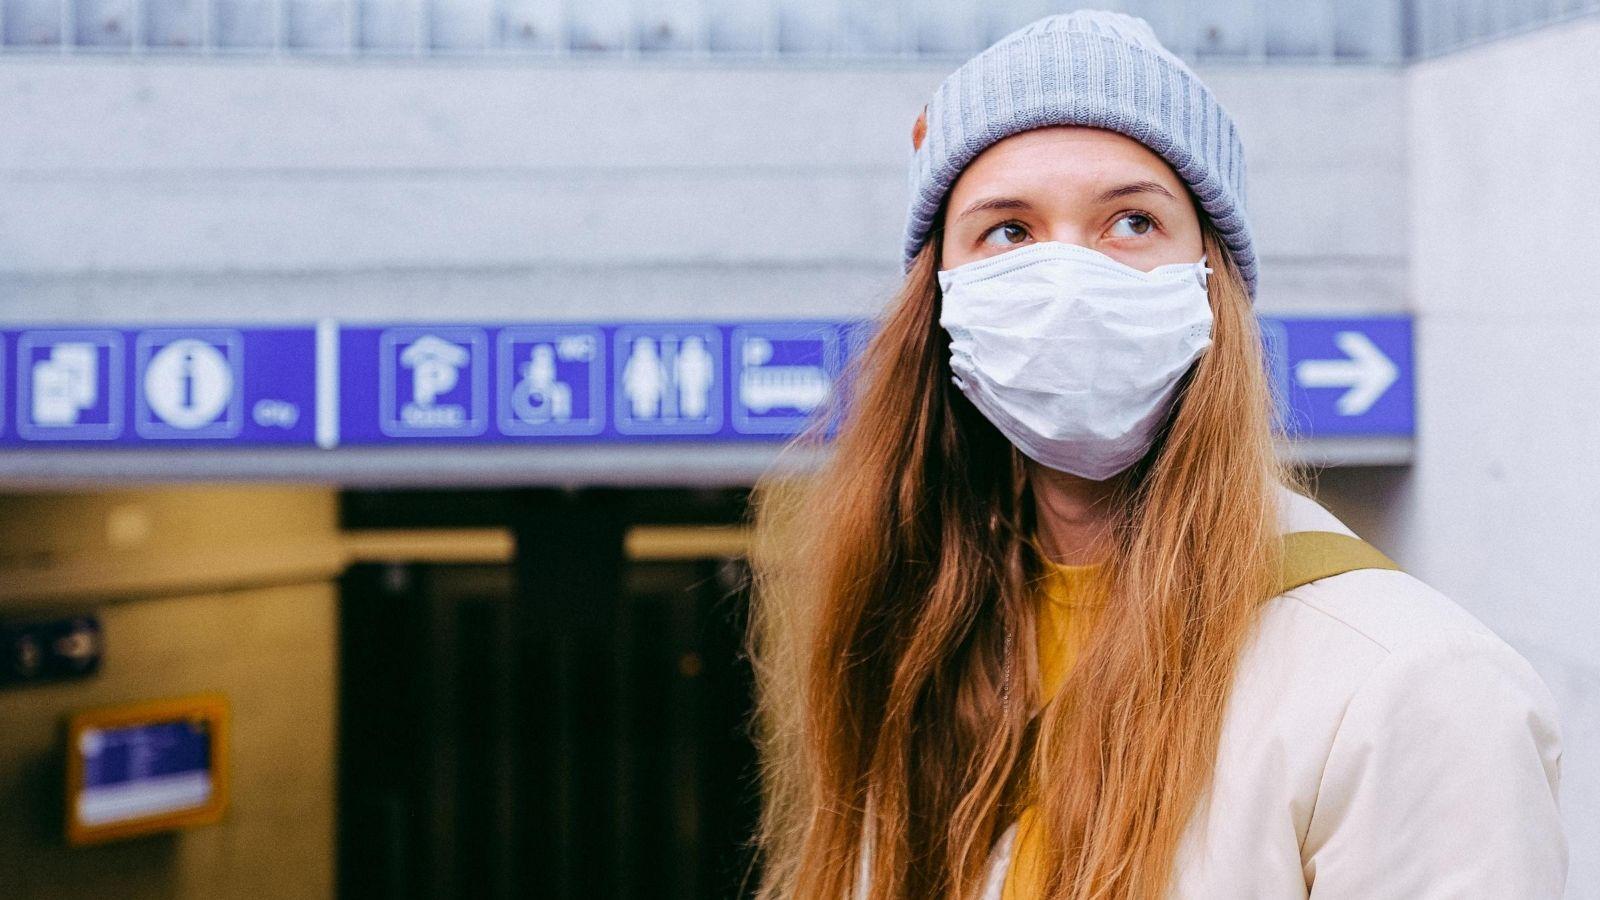 Jak Polacy traktują pandemię? (BADANIE) pandemia mediarun pandemia